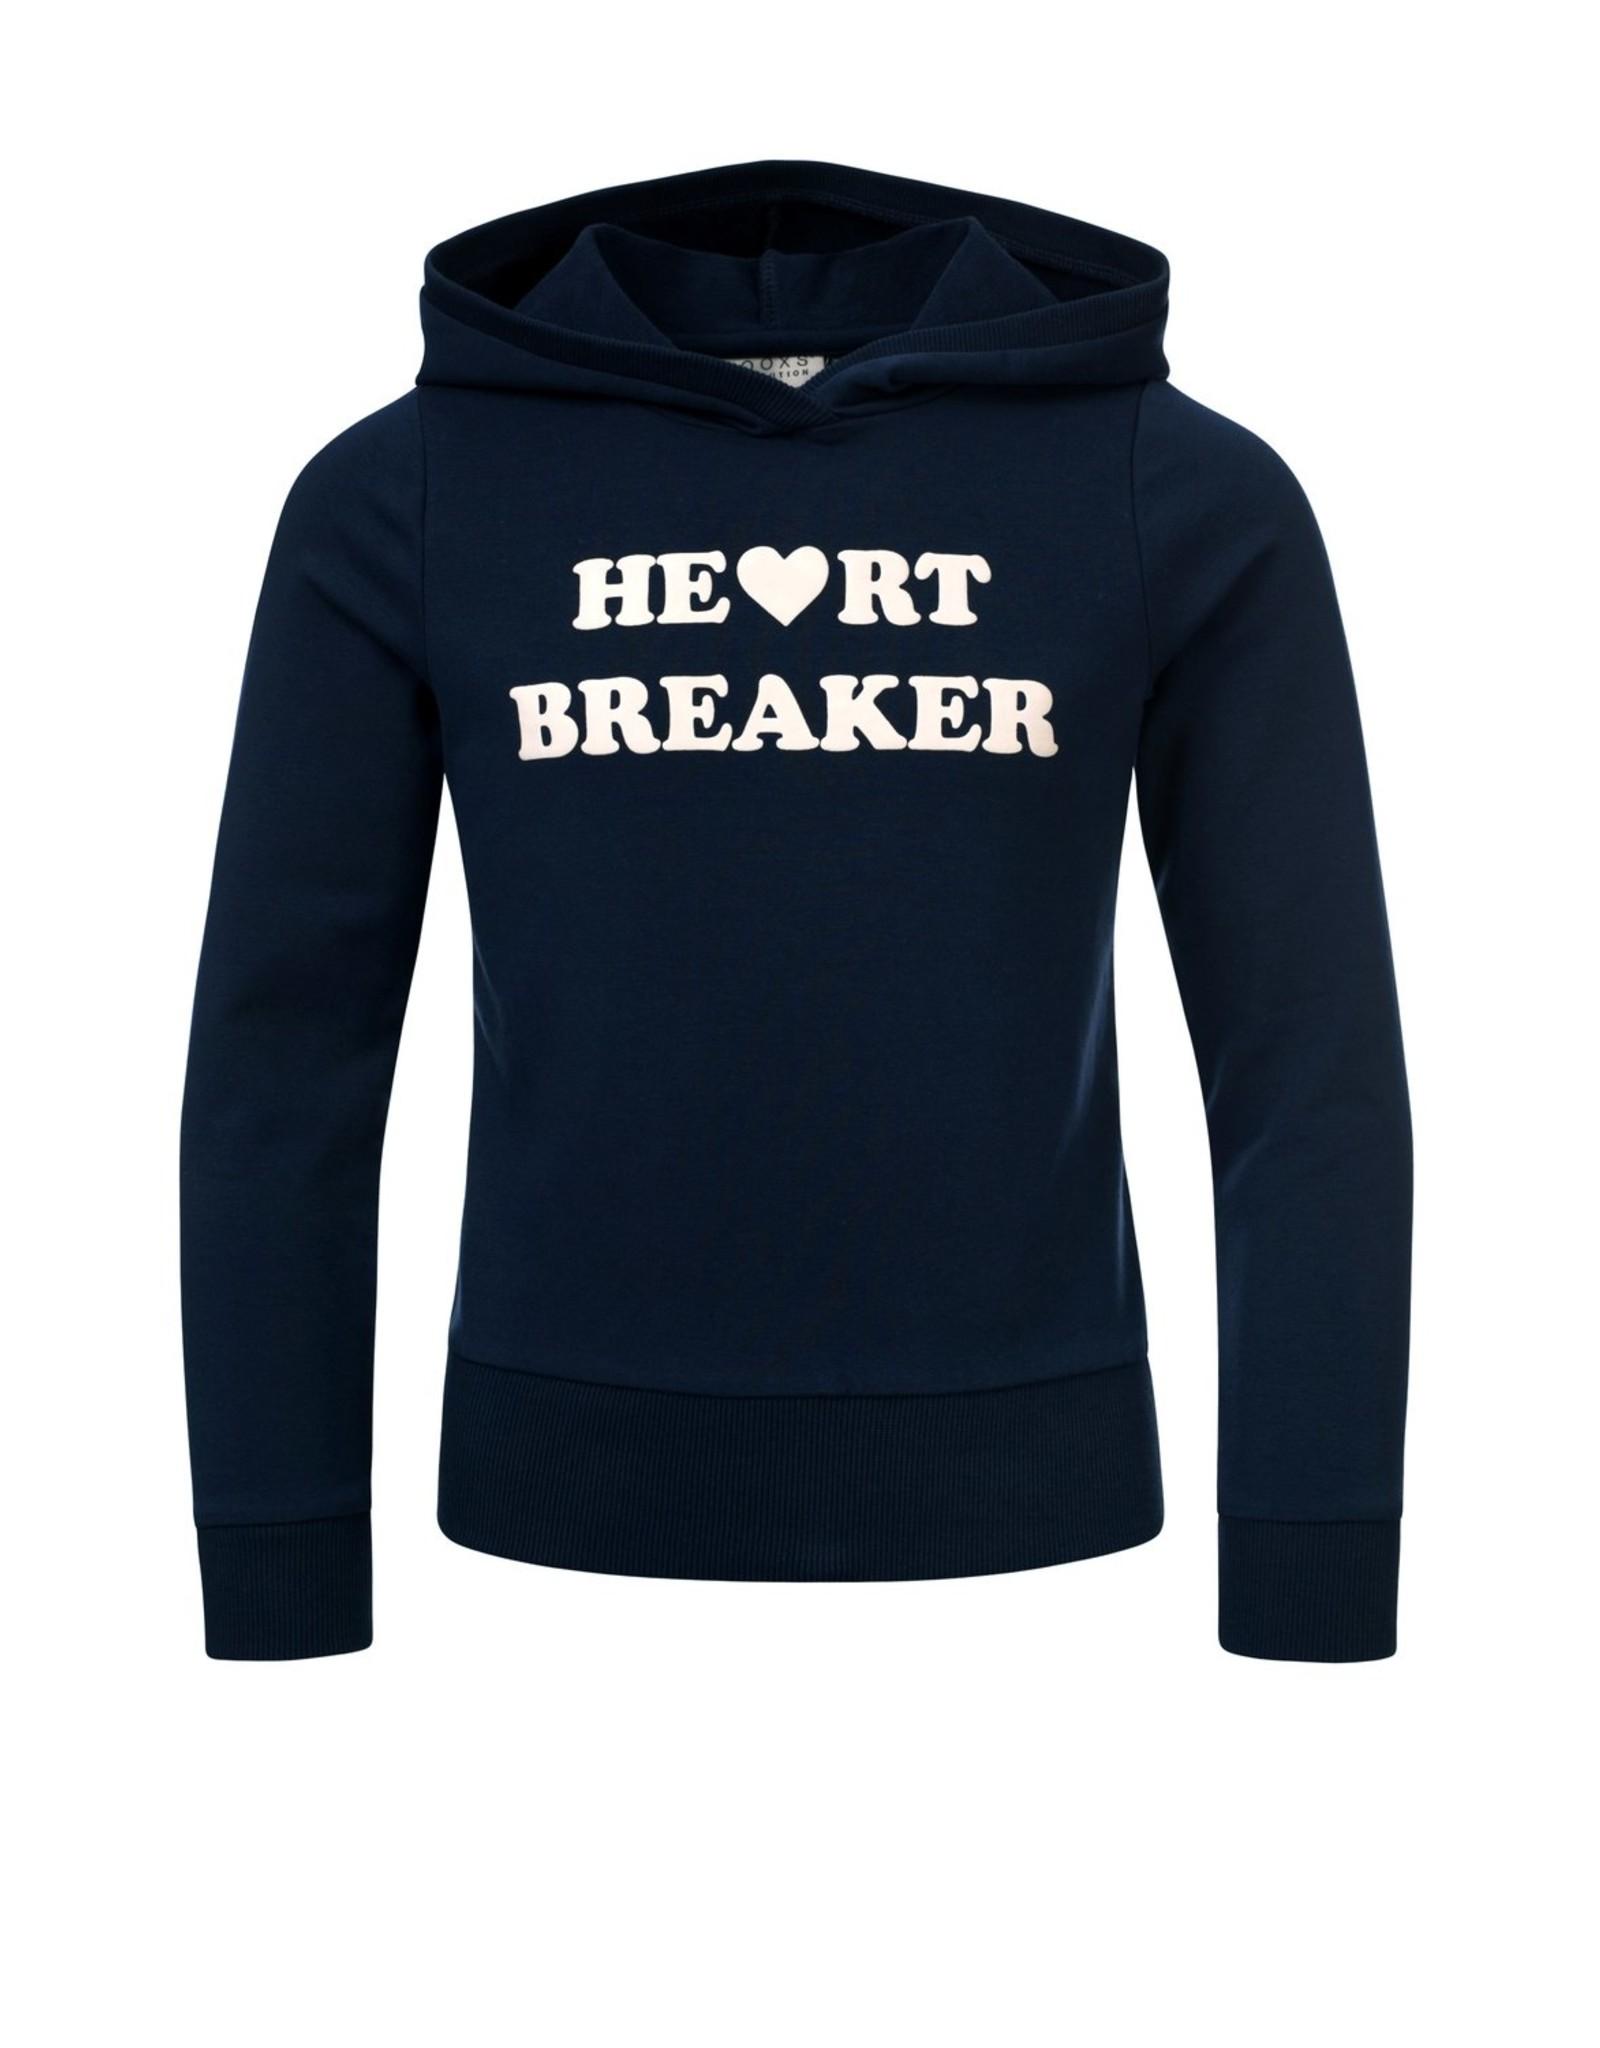 Looxs 10SIXTEEN Girls Hoody sweater maat 128